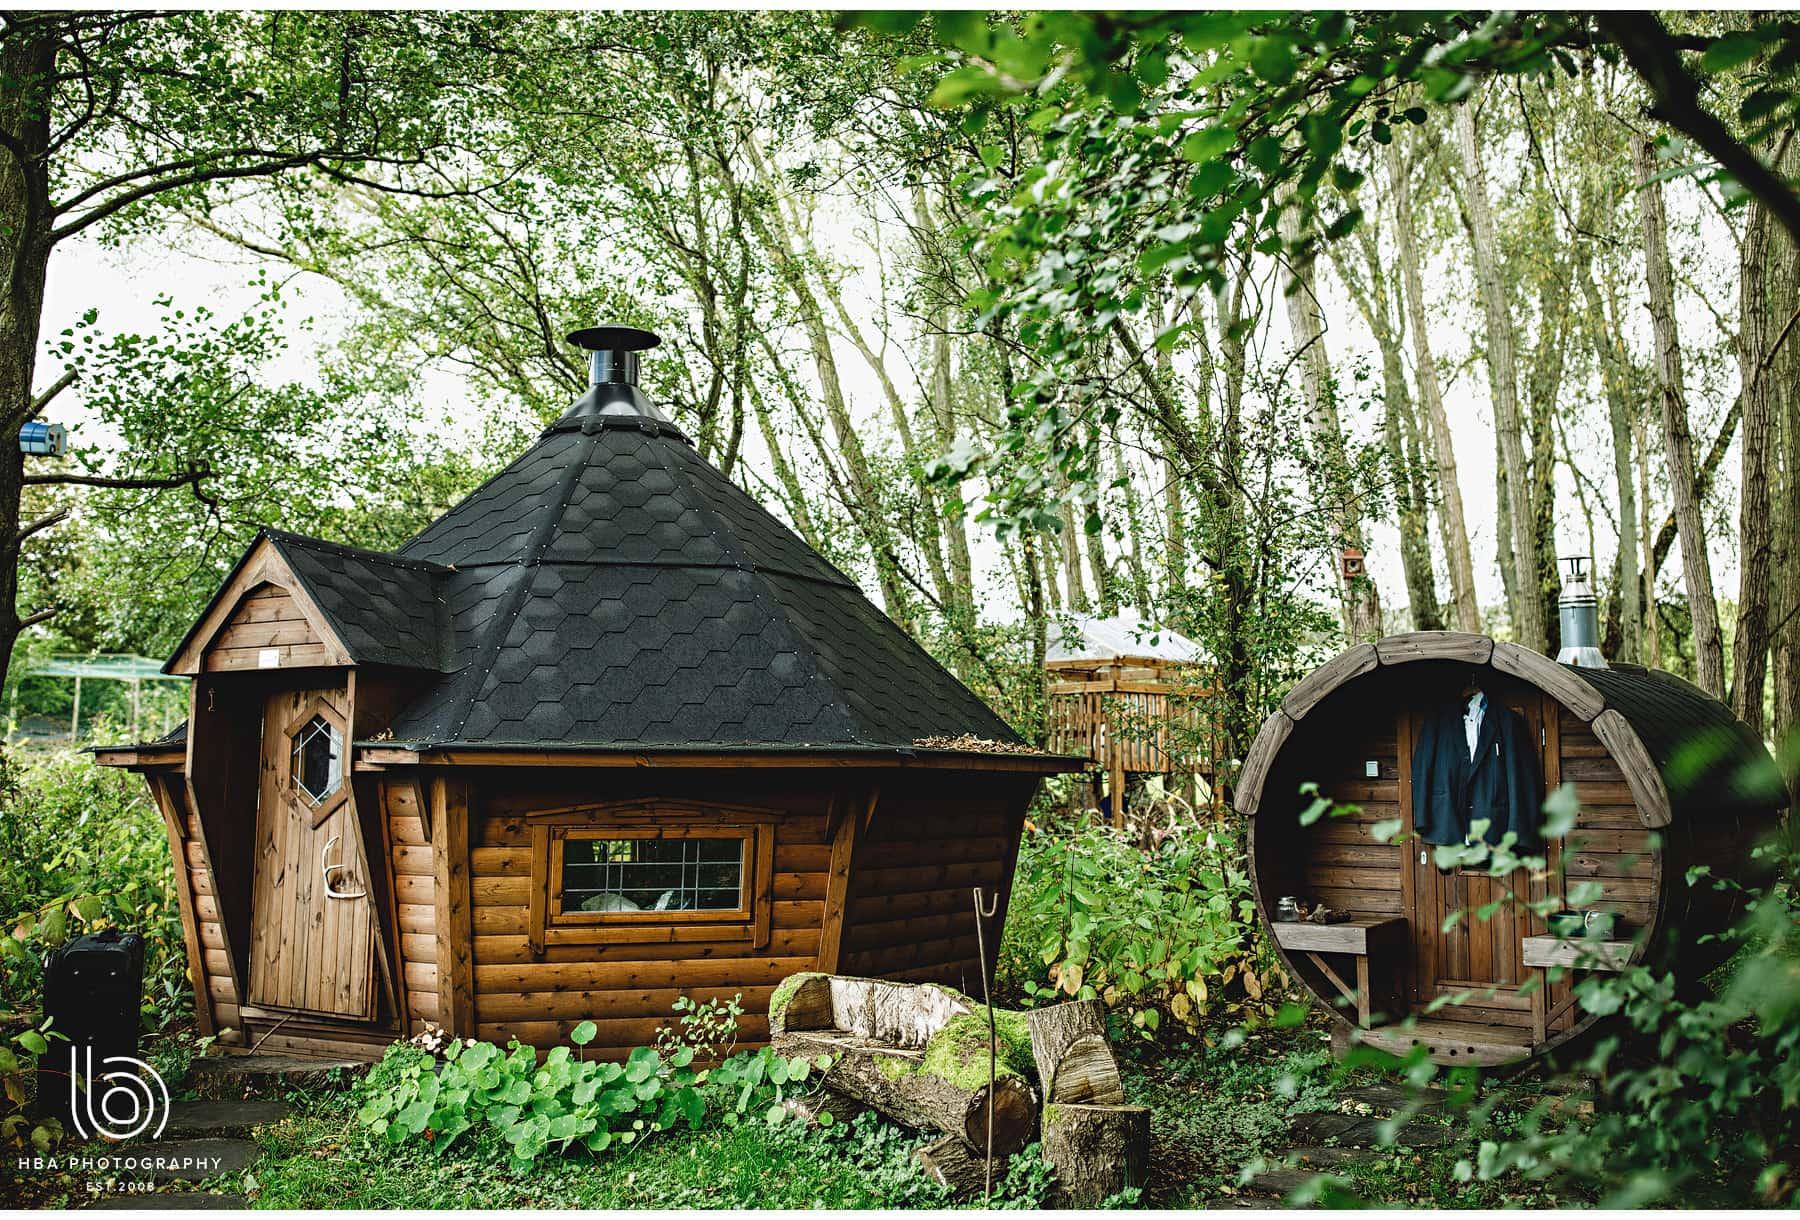 The BBQ hut in the garden